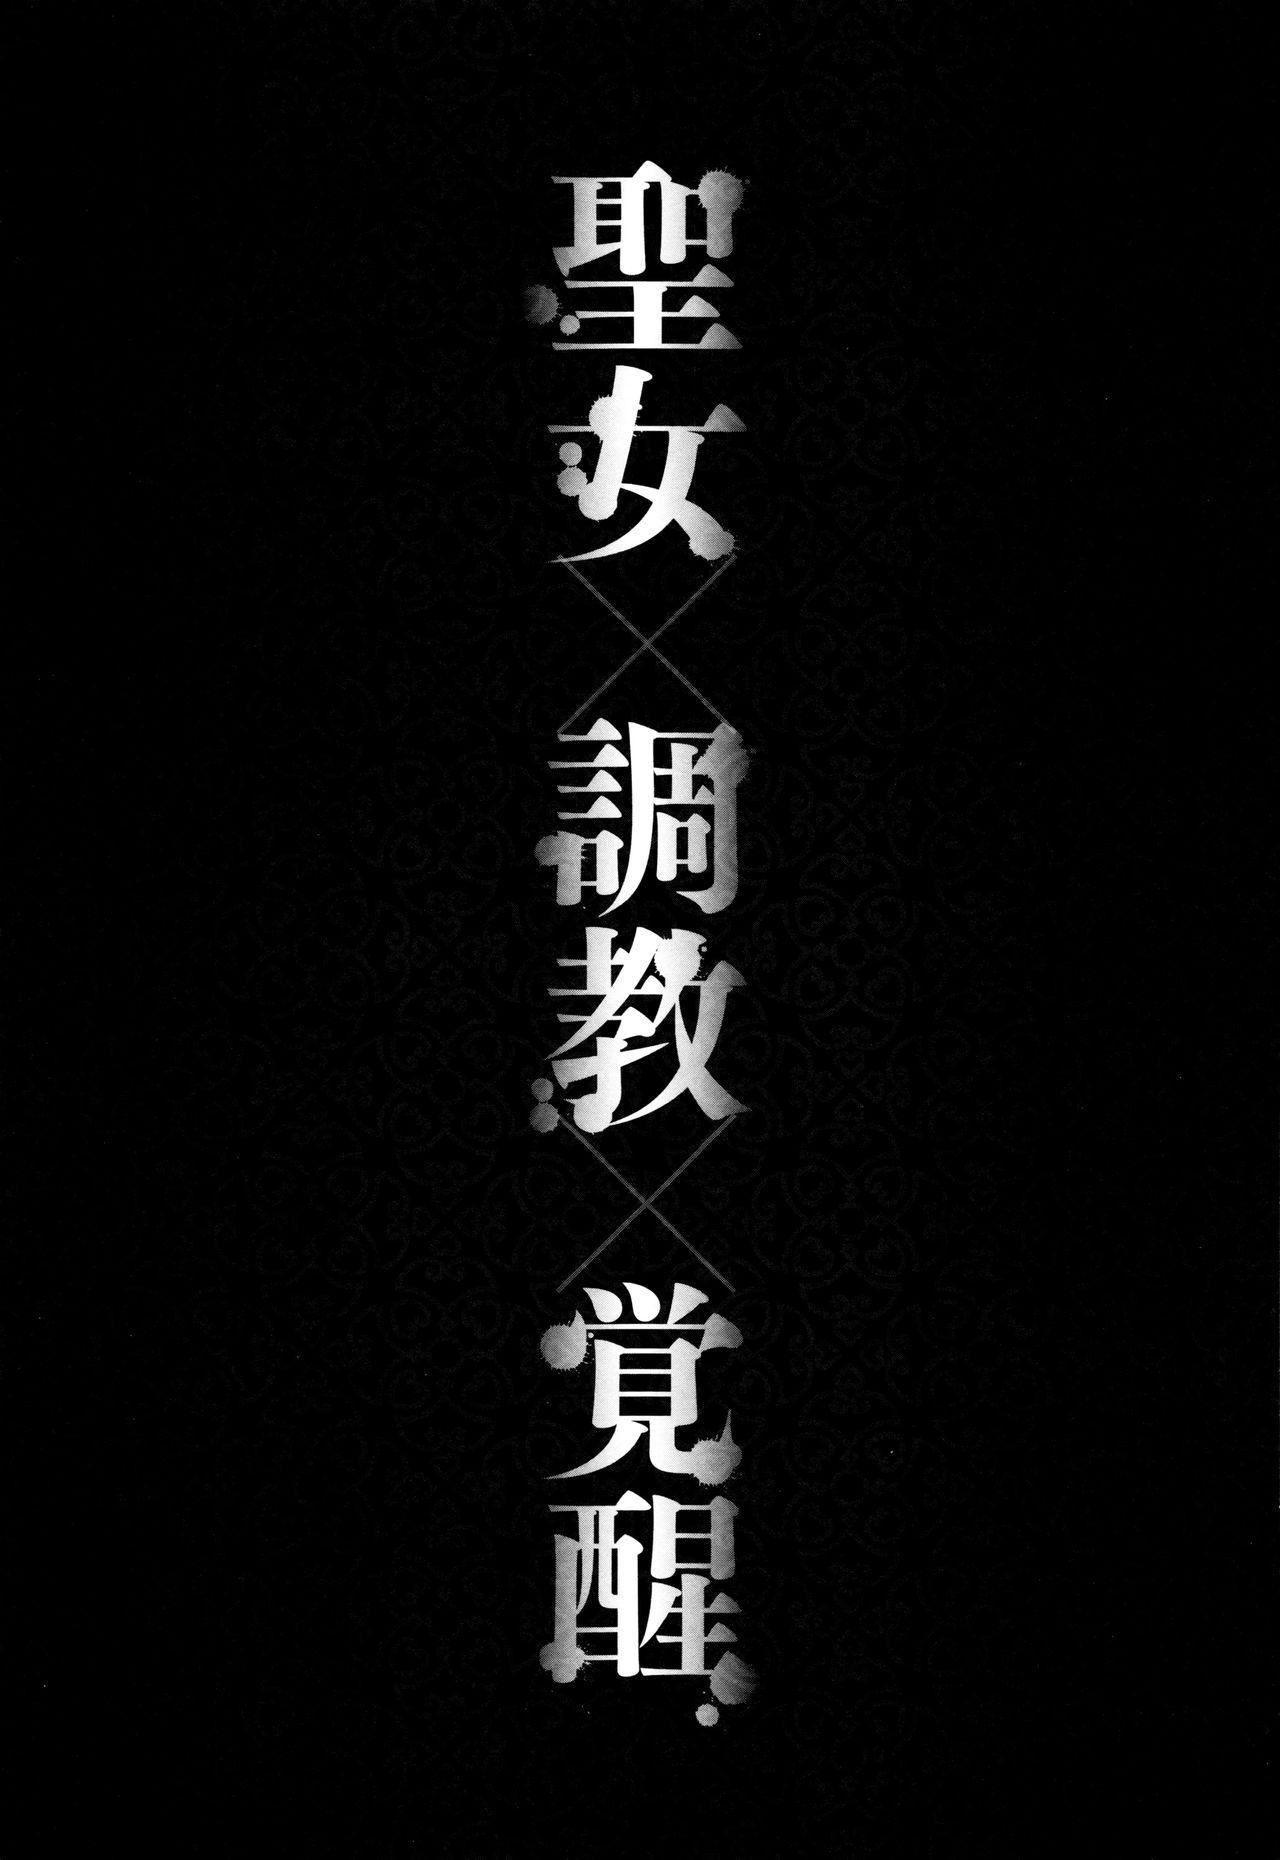 [Amano Kazumi] Seida Inyou -Seijo no Katachi Shita Intou- | 聖墮陰陽 -聖女的容貌與淫蕩- [Chinese] 6